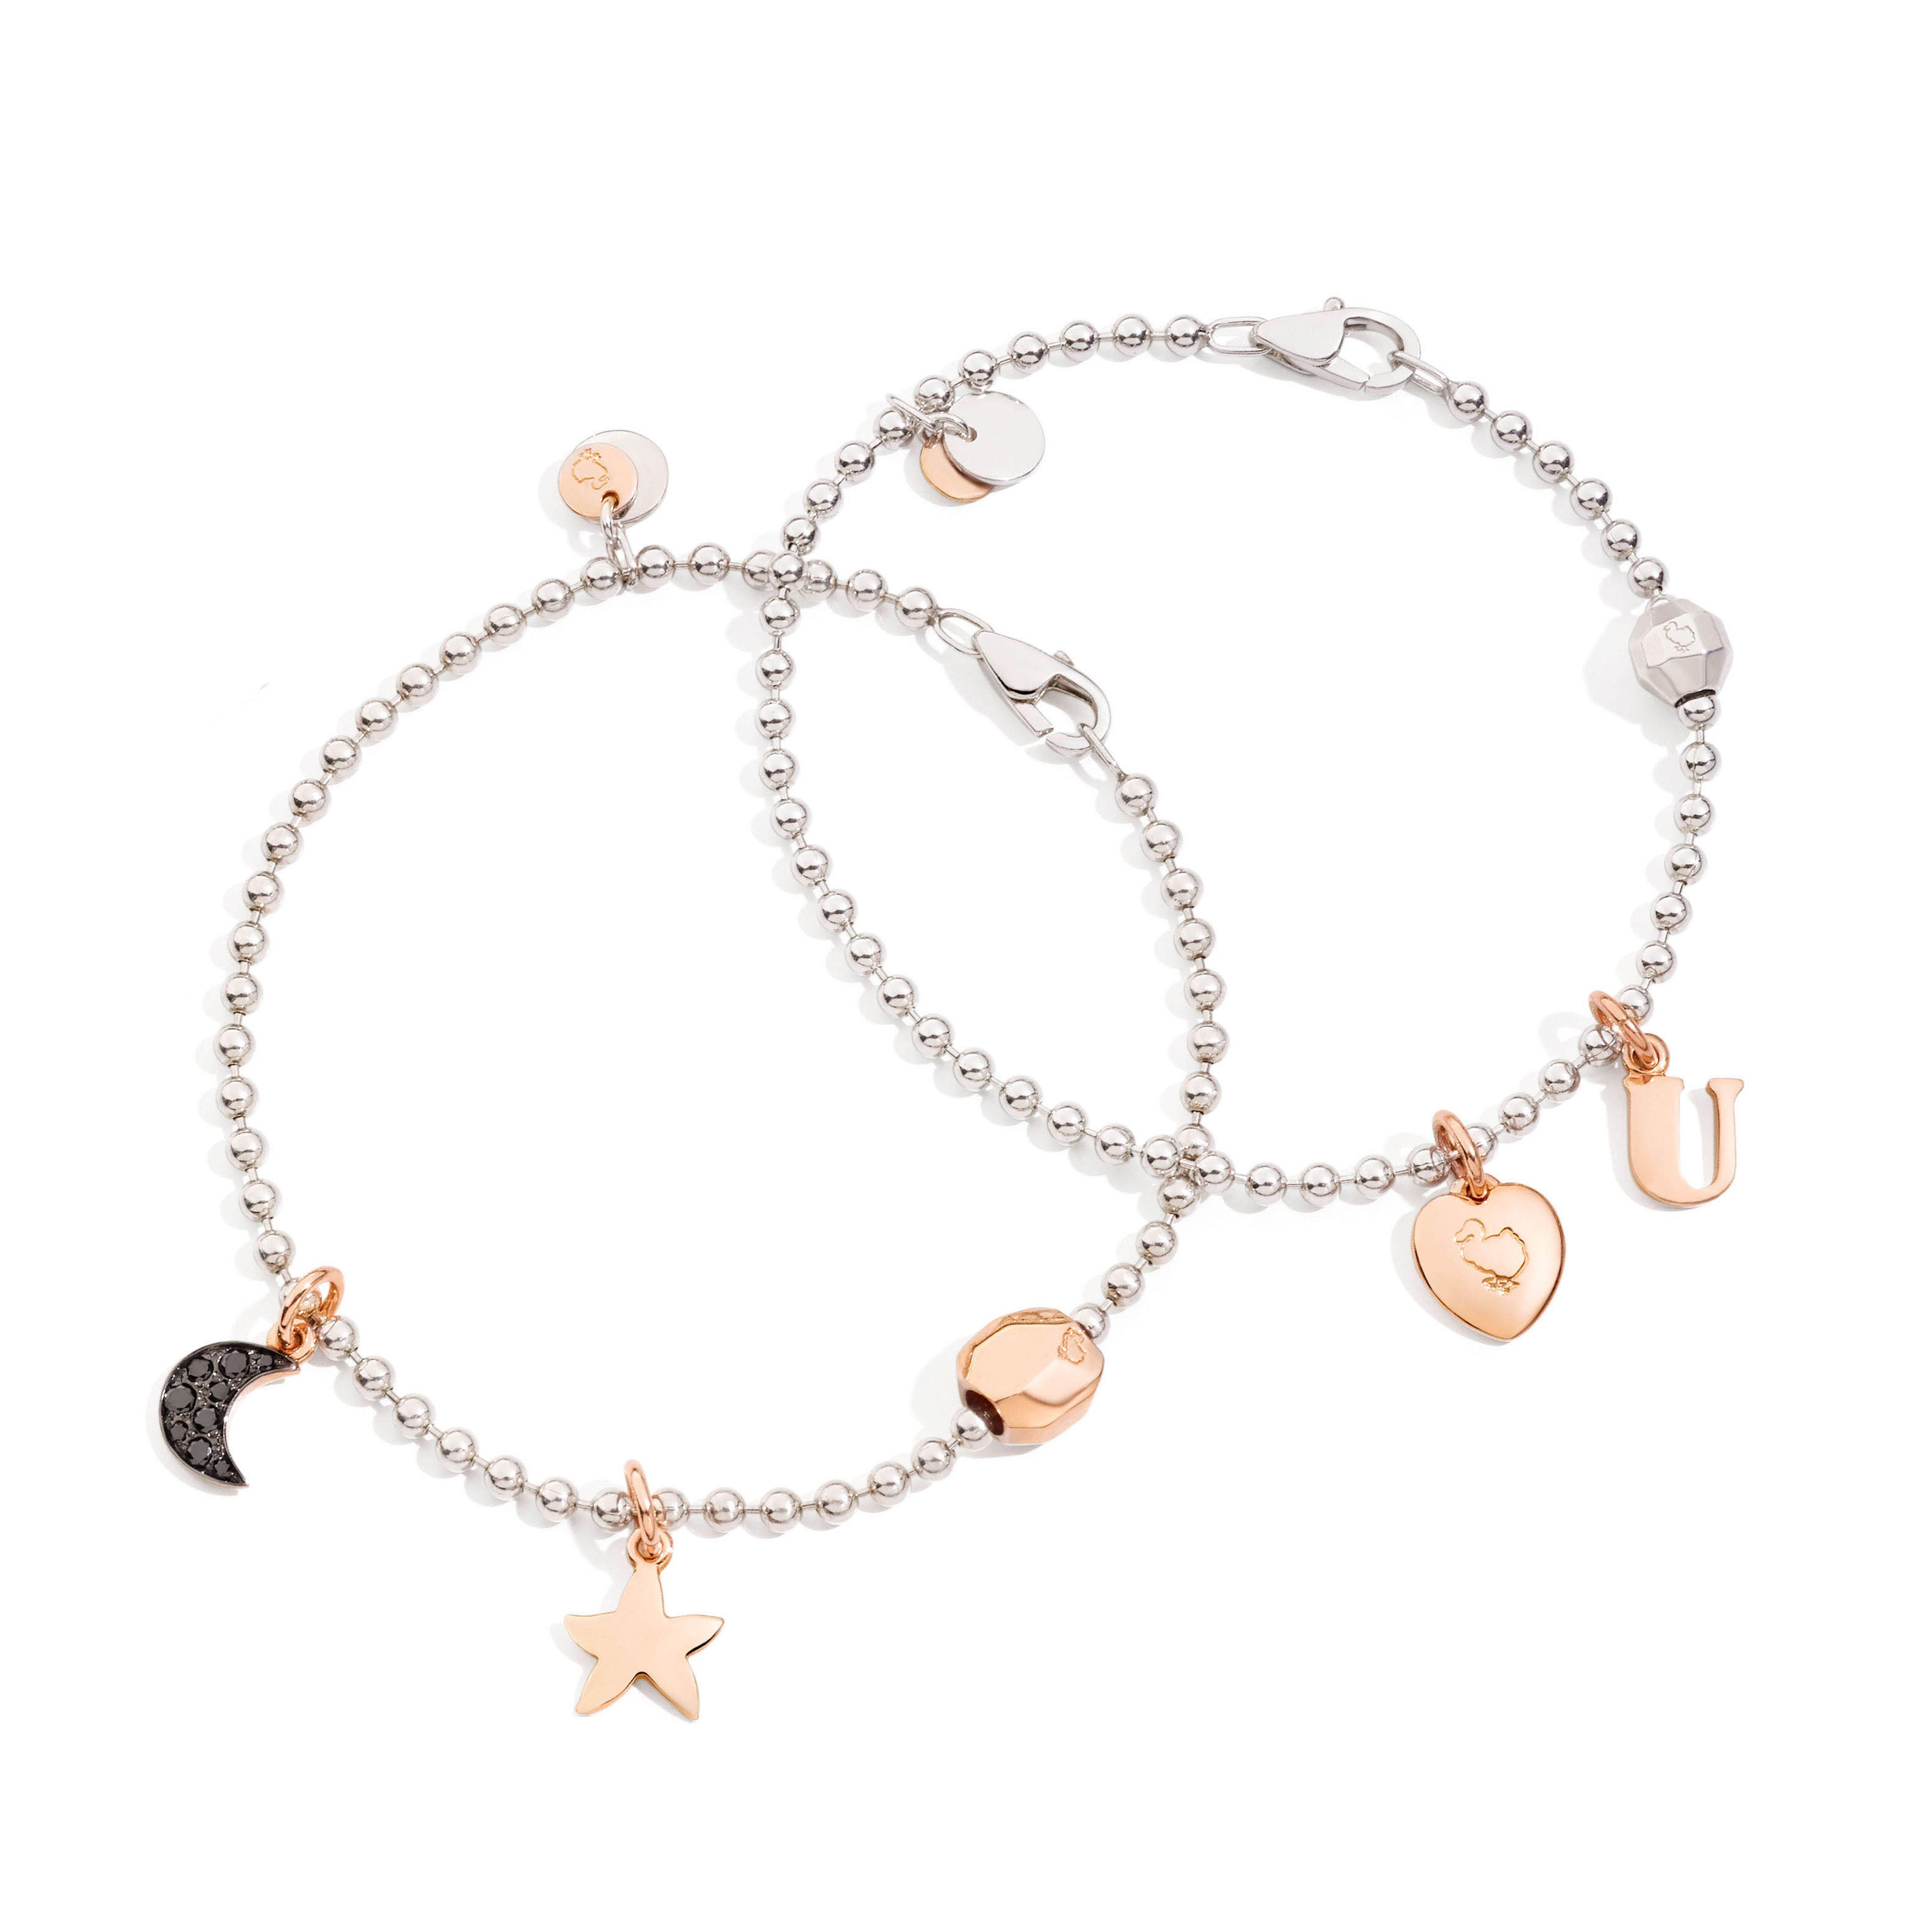 Enjoy Composing Your Dodo Everyday Bracelet With Your